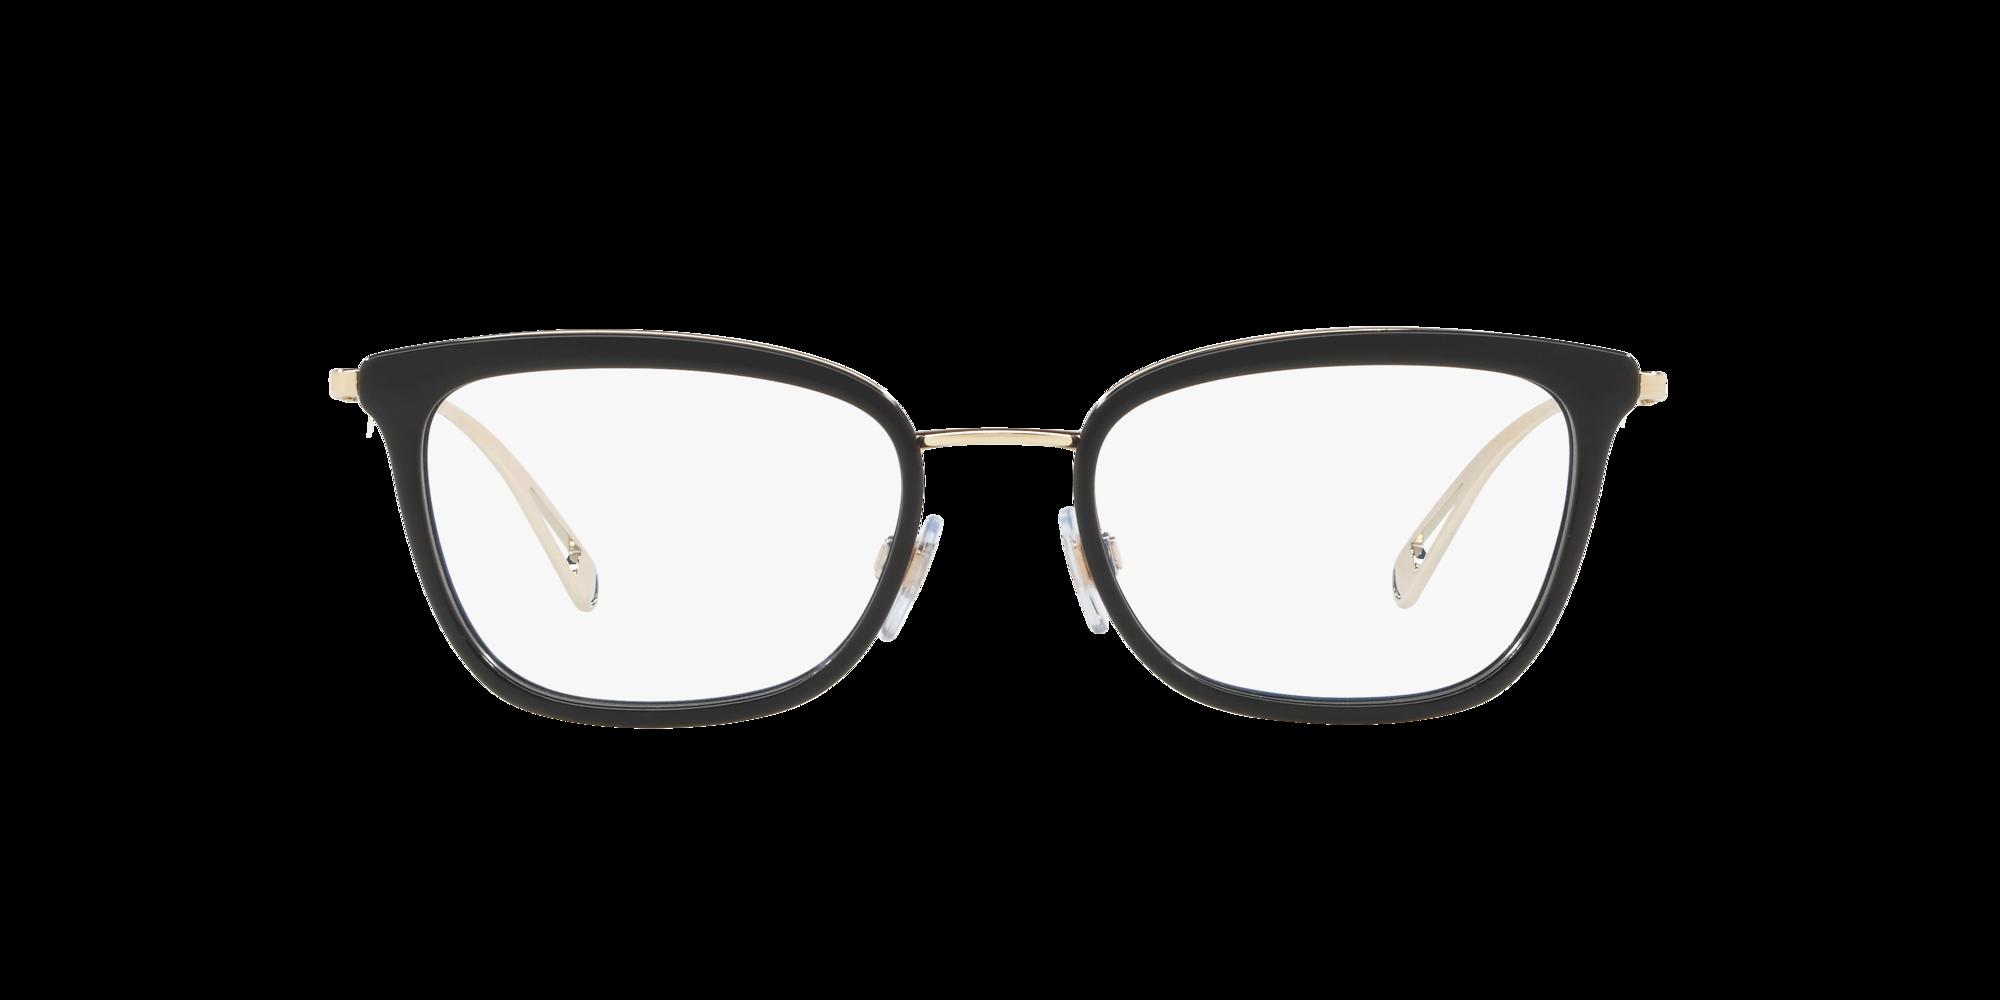 Image for AR5078 from LensCrafters | Glasses, Prescription Glasses Online, Eyewear